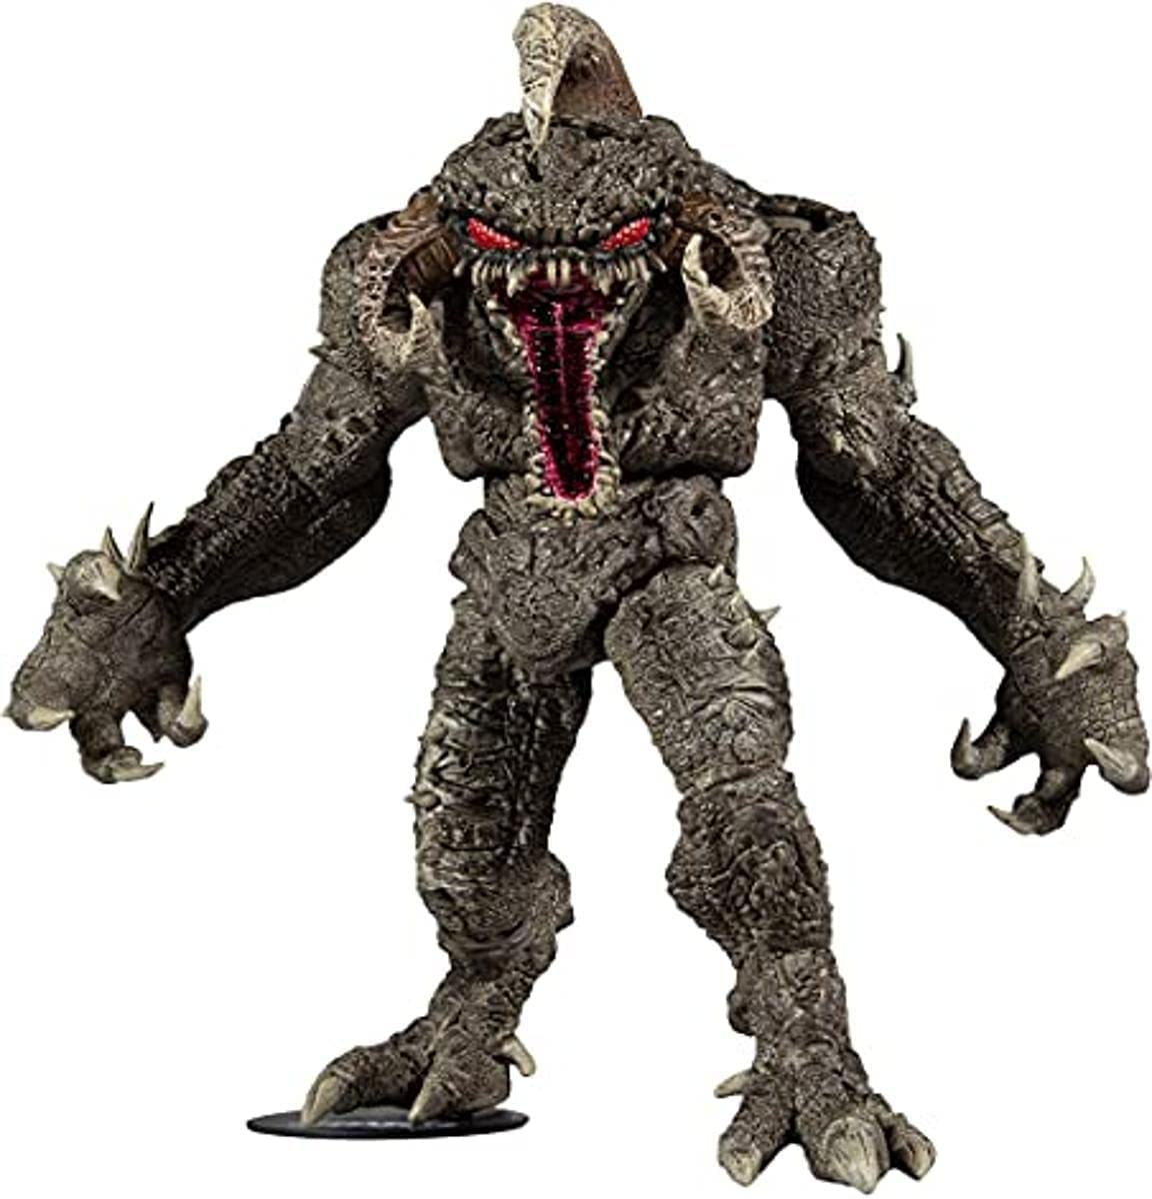 McFarlane Toys Spawn The Figure Mega Violator Action Fees free Super sale period limited